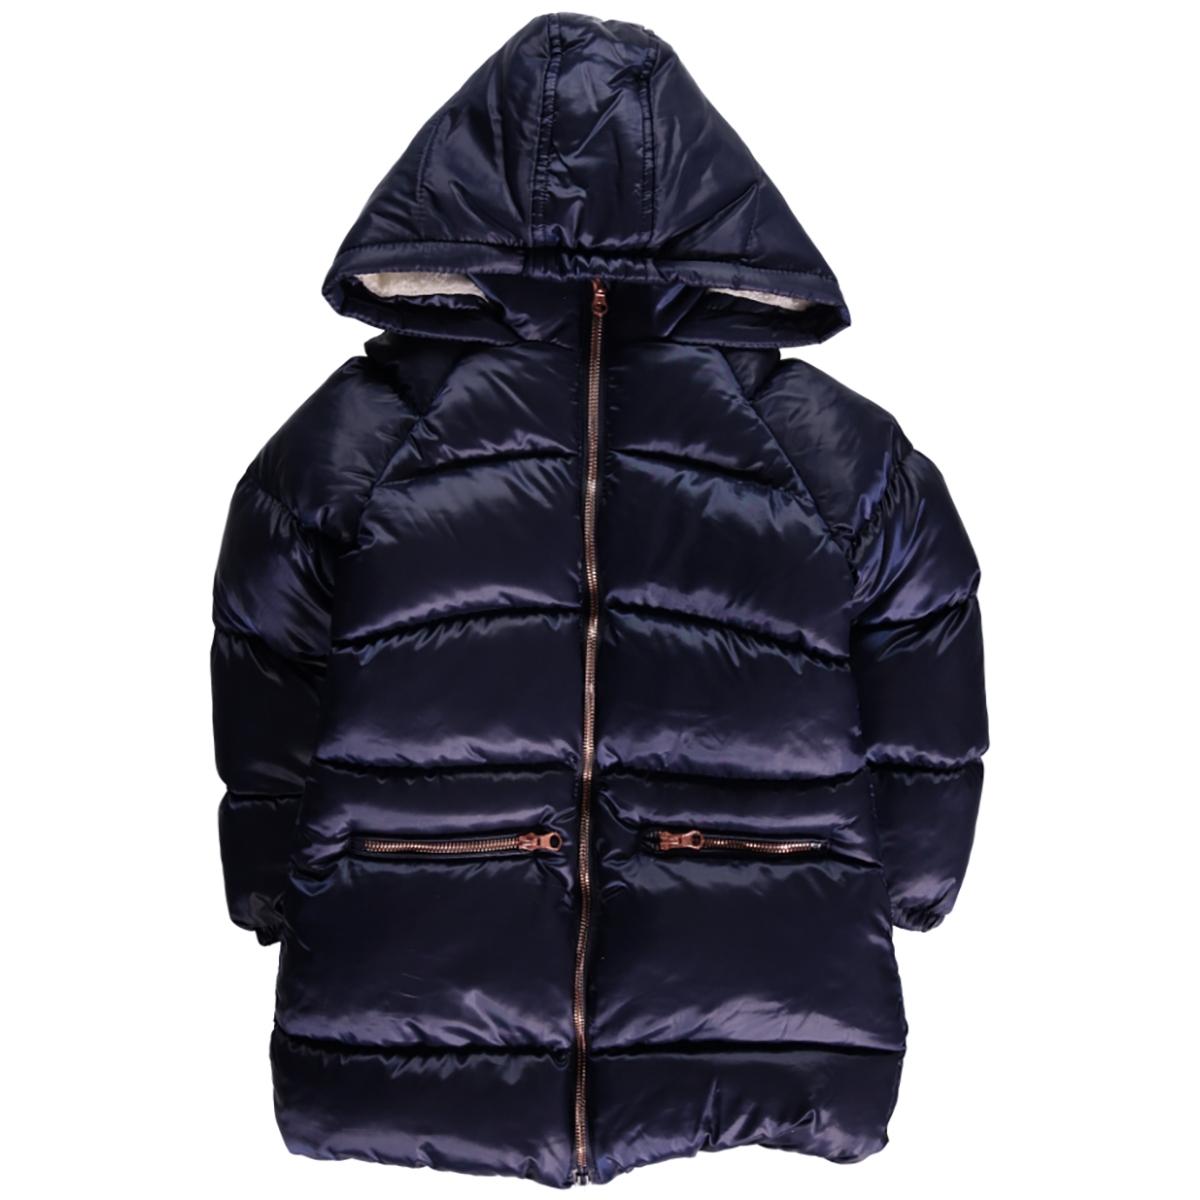 Civil Girls Girl Coat 6-9 Years Old, Dark Blue